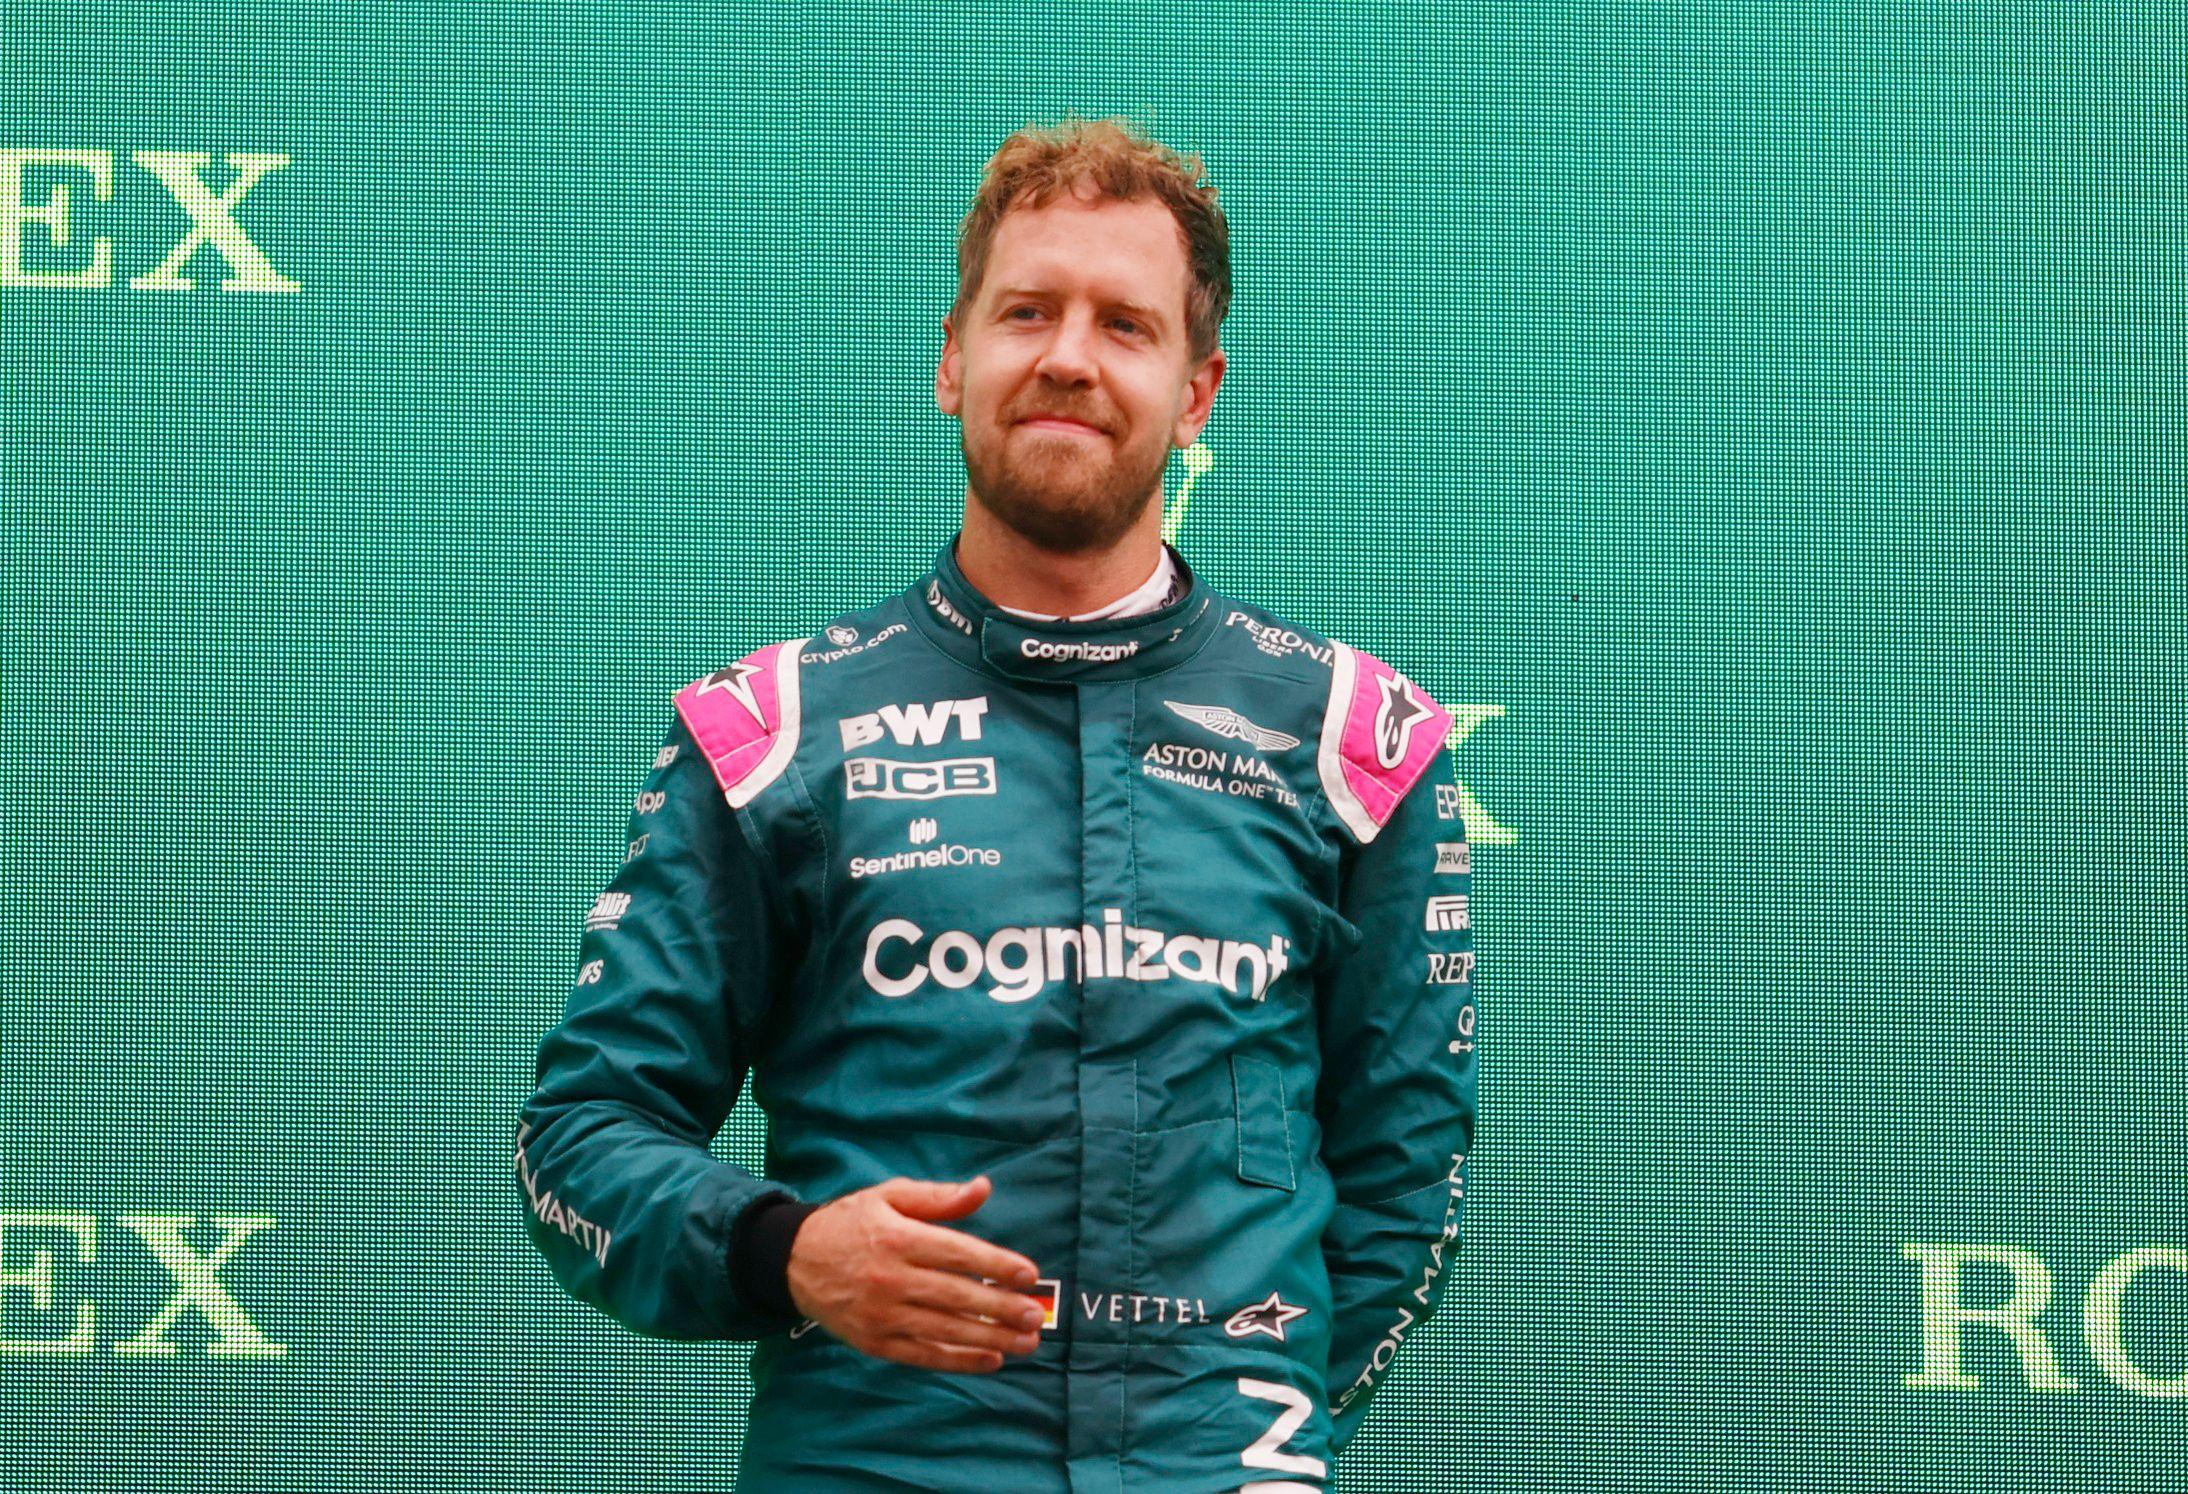 Formula 1: Τιμωρήθηκε o Φέτελ και βγήκε δεύτερος ο Χάμιλτον στην Ουγγαρία